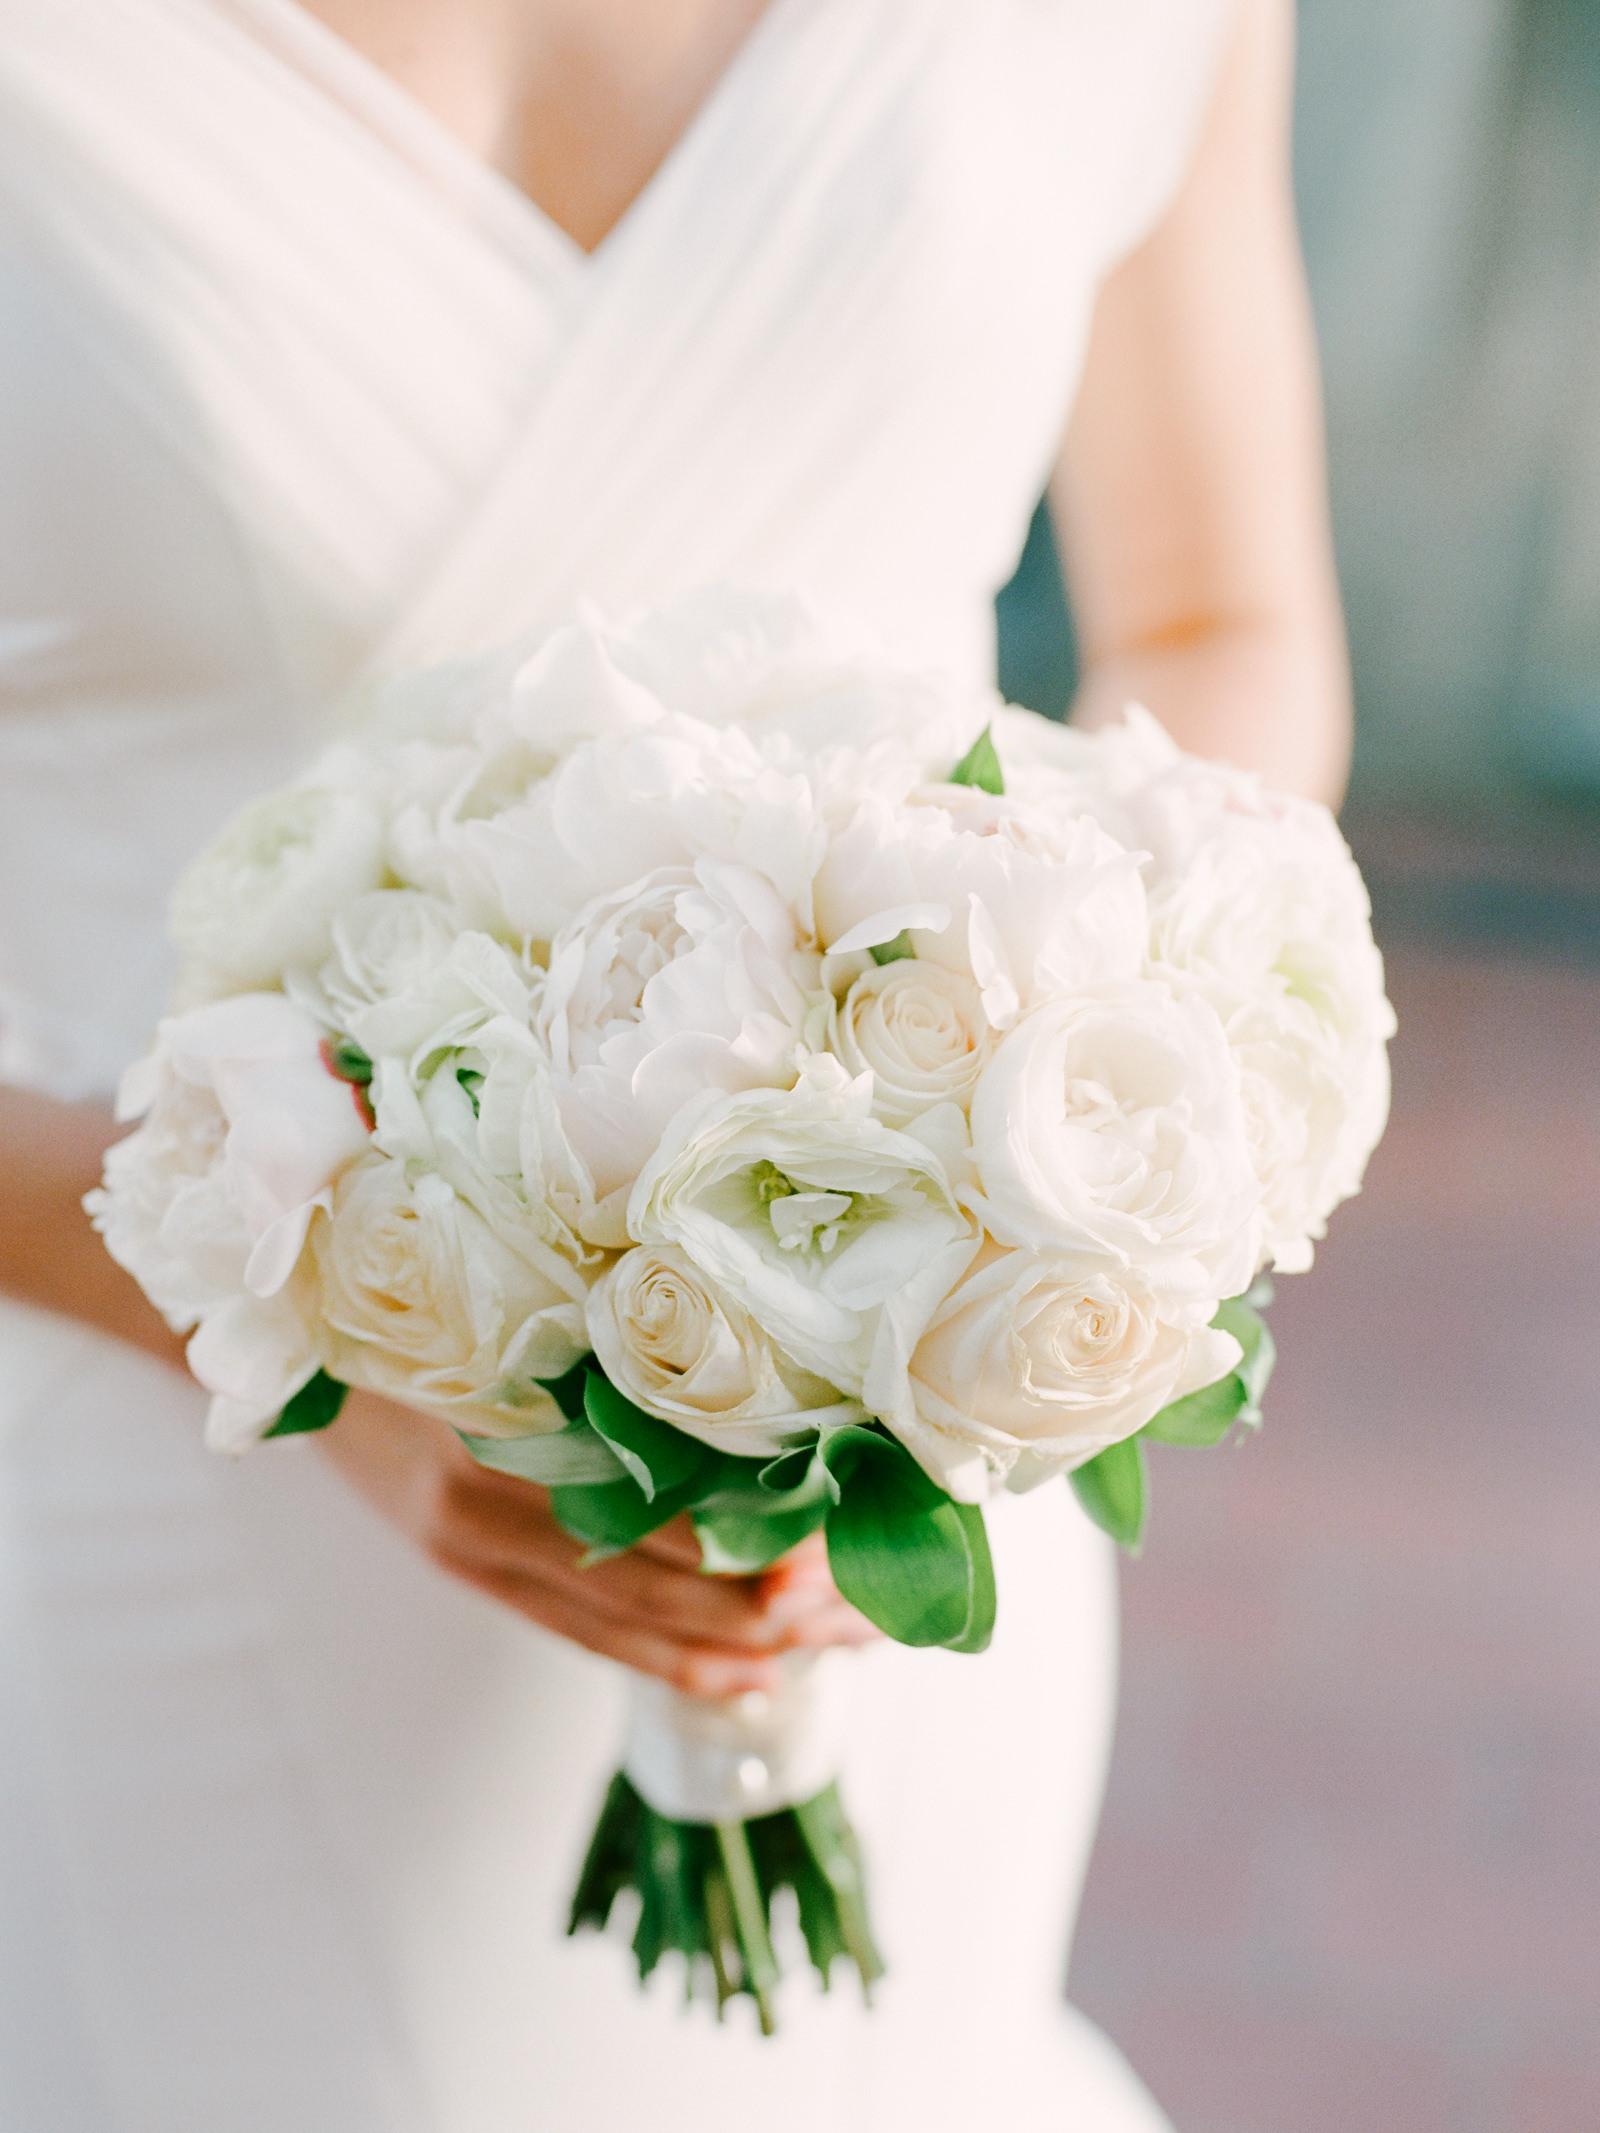 Intimate-NYC_wedding_ by Tanya Isaeva-142.jpg